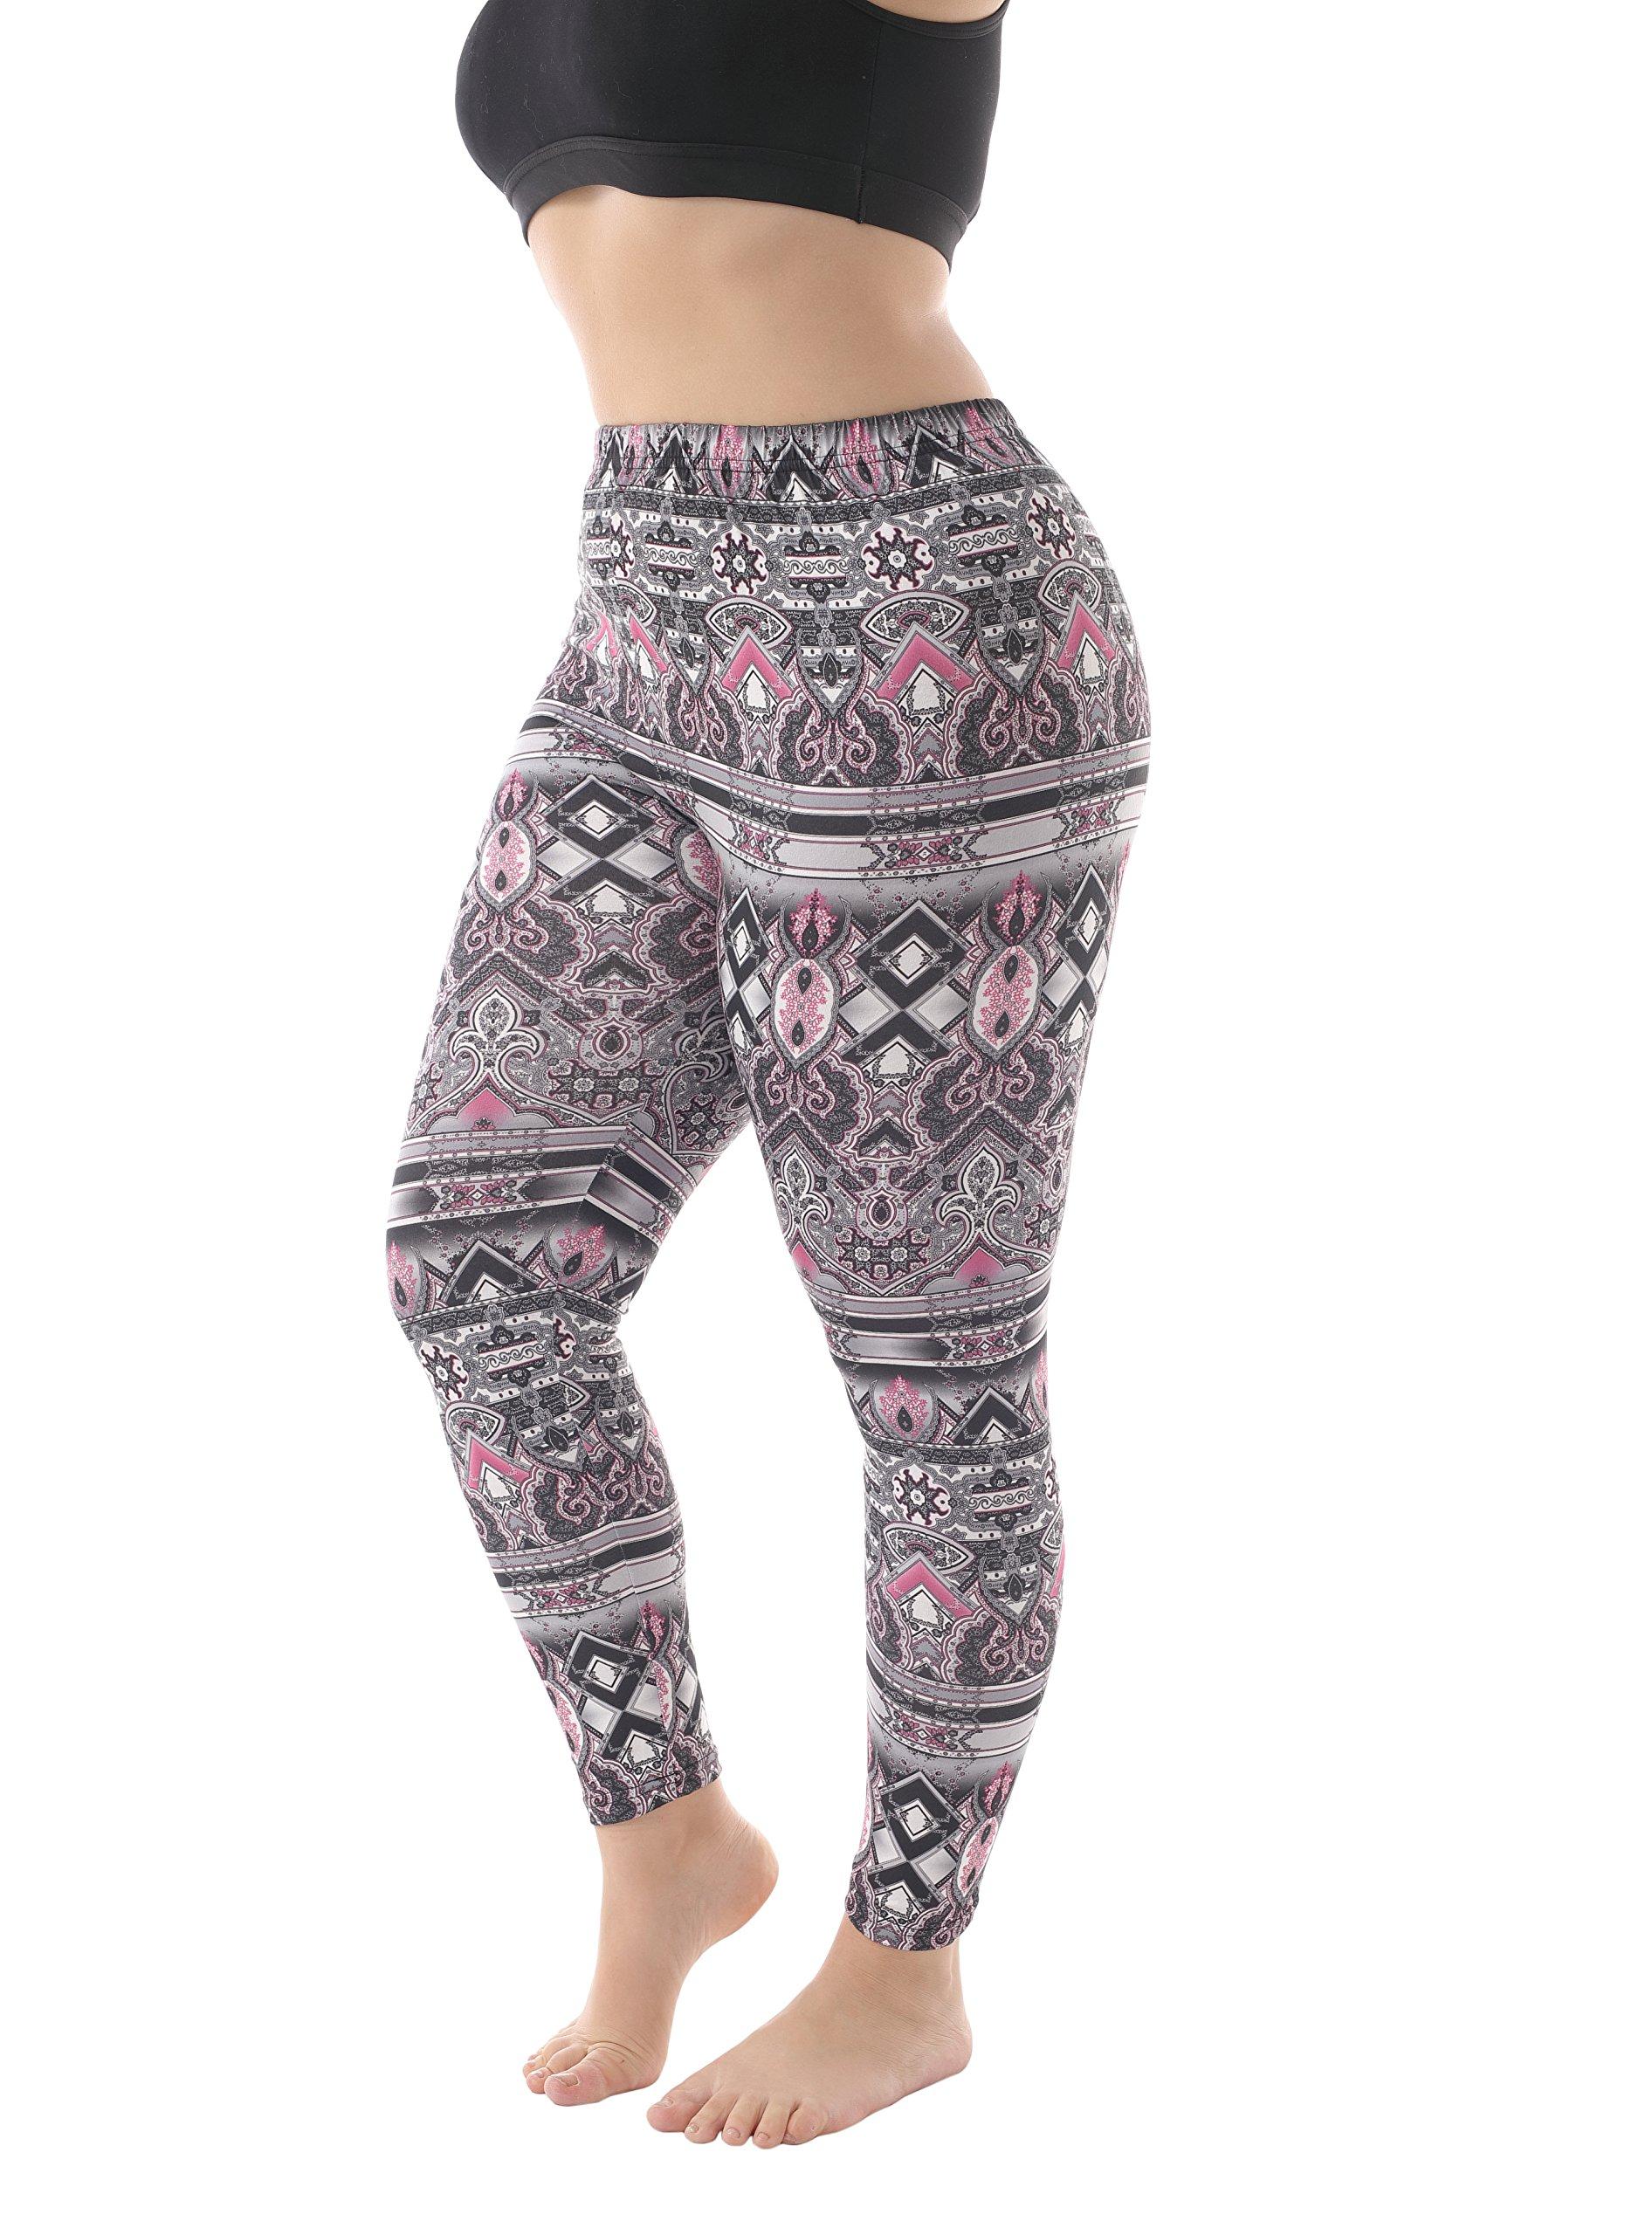 ZERDOCEAN Women's Plus Size Lightweight Printed Leggings for Summer style-001 4X